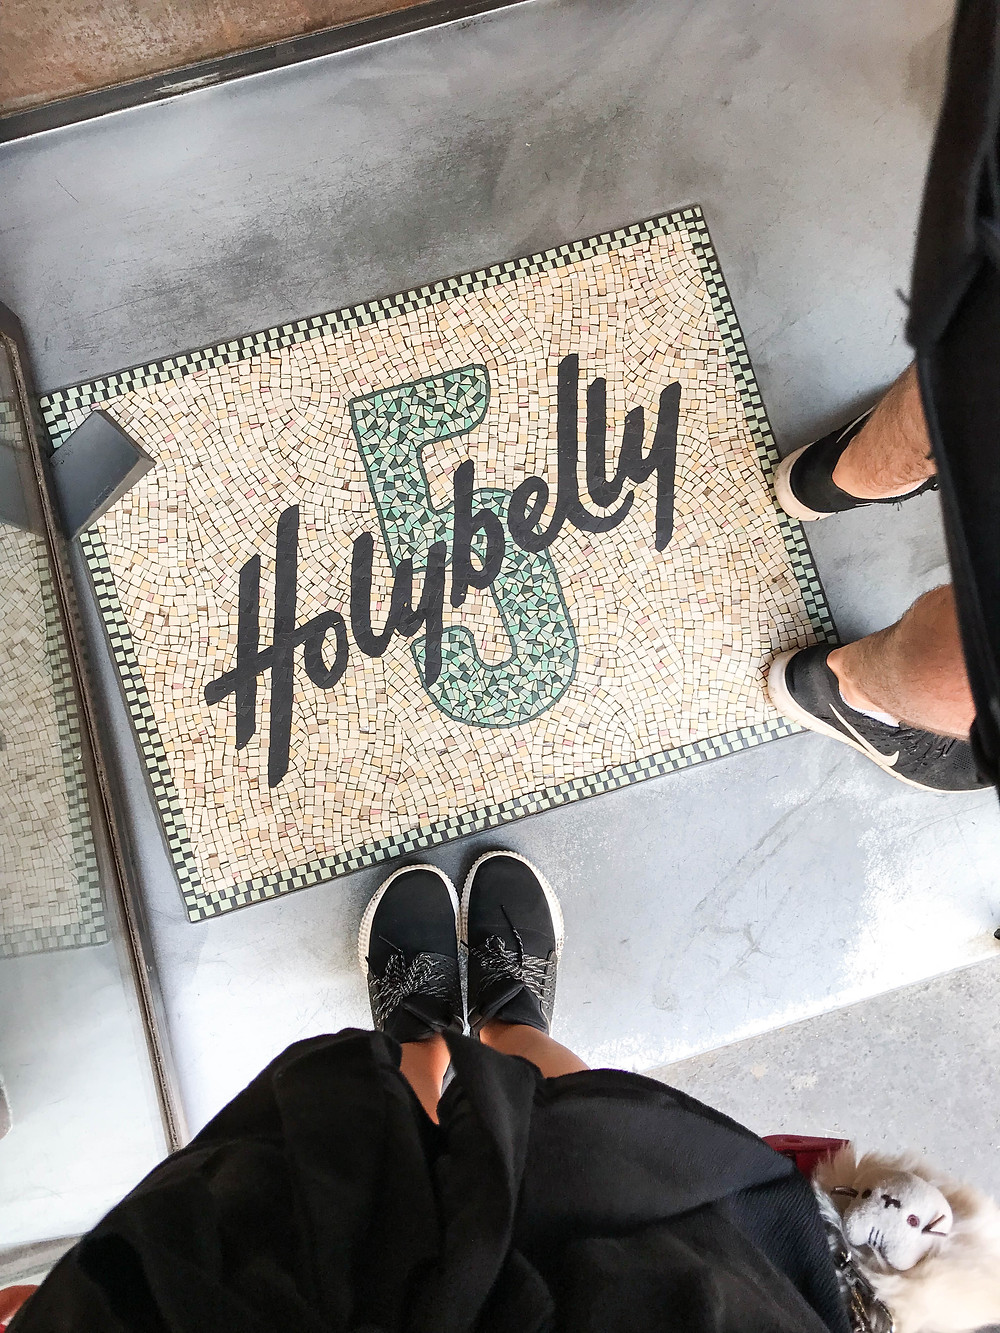 Holybelly, Paris, France